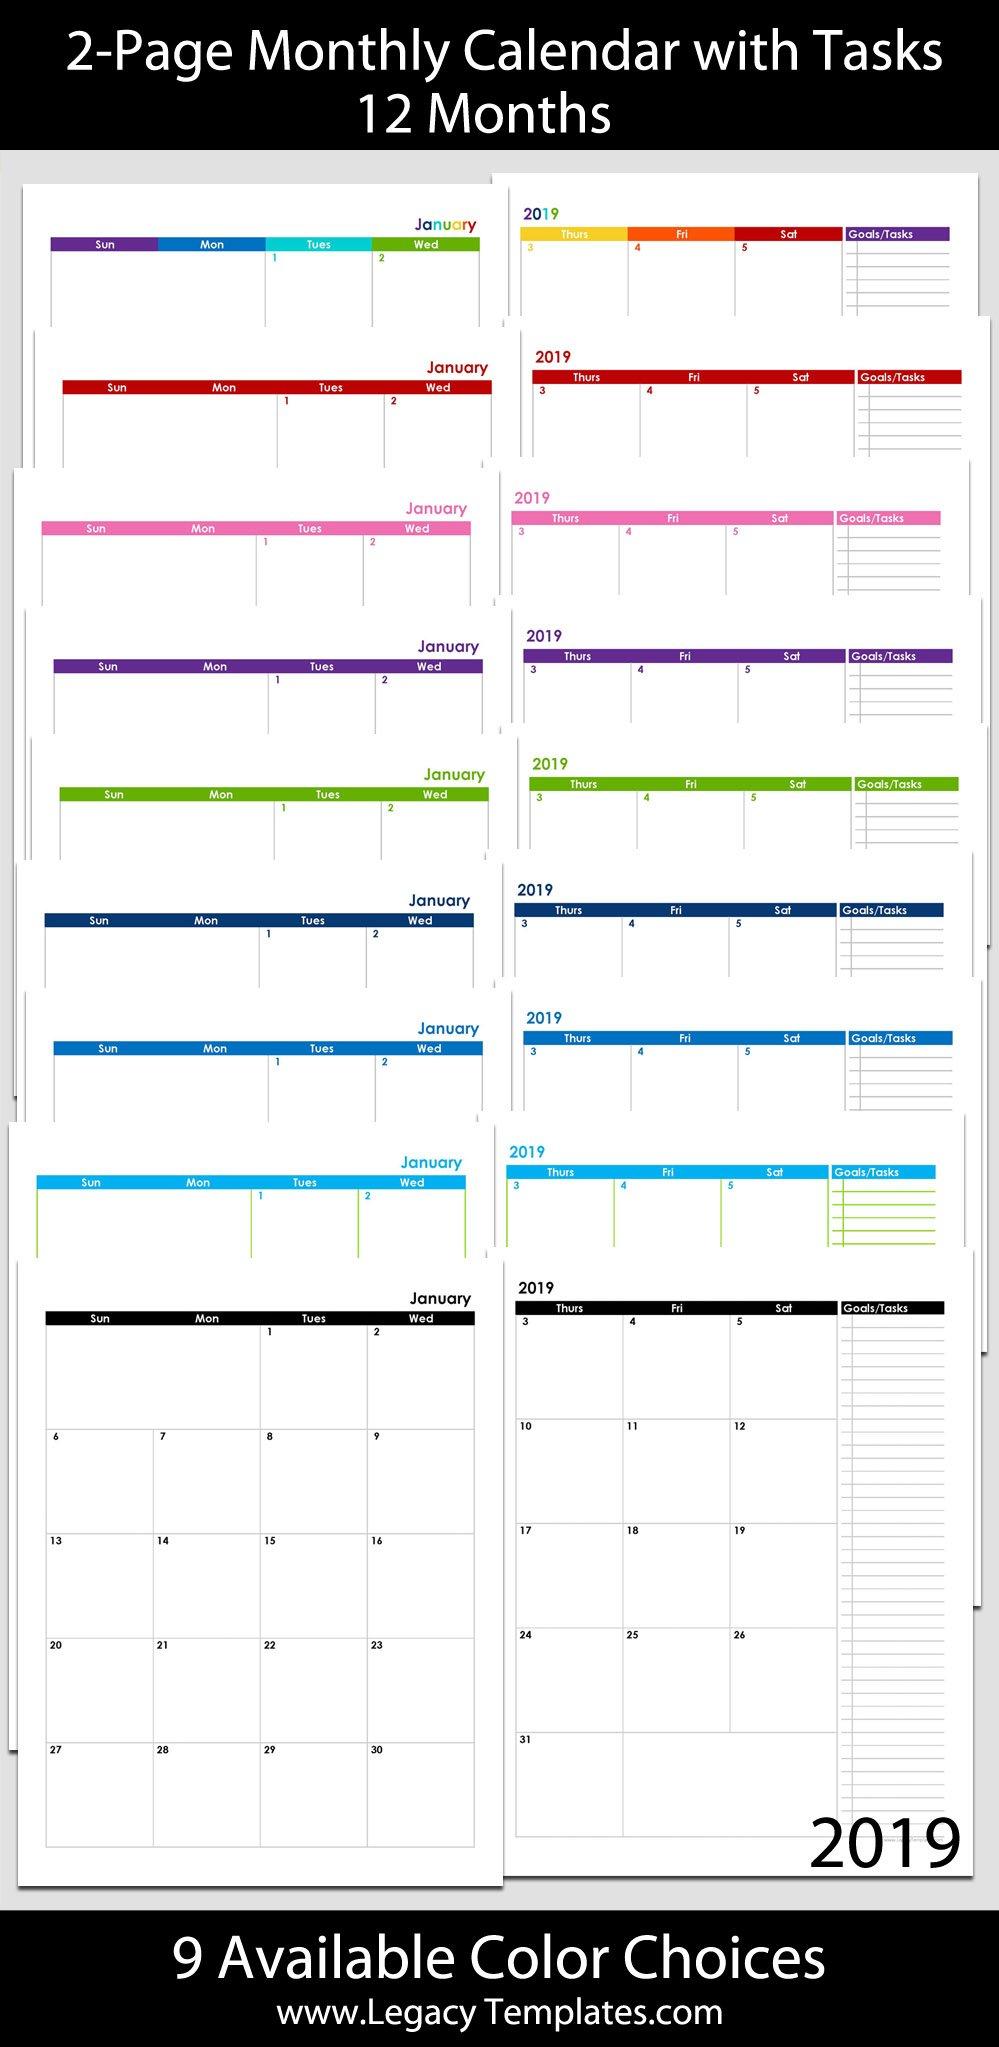 2019 12-Month 2-Page Calendar – 8.5 X 11 | Legacy Templates 8.5 X 11 Printer Friendly Calendar